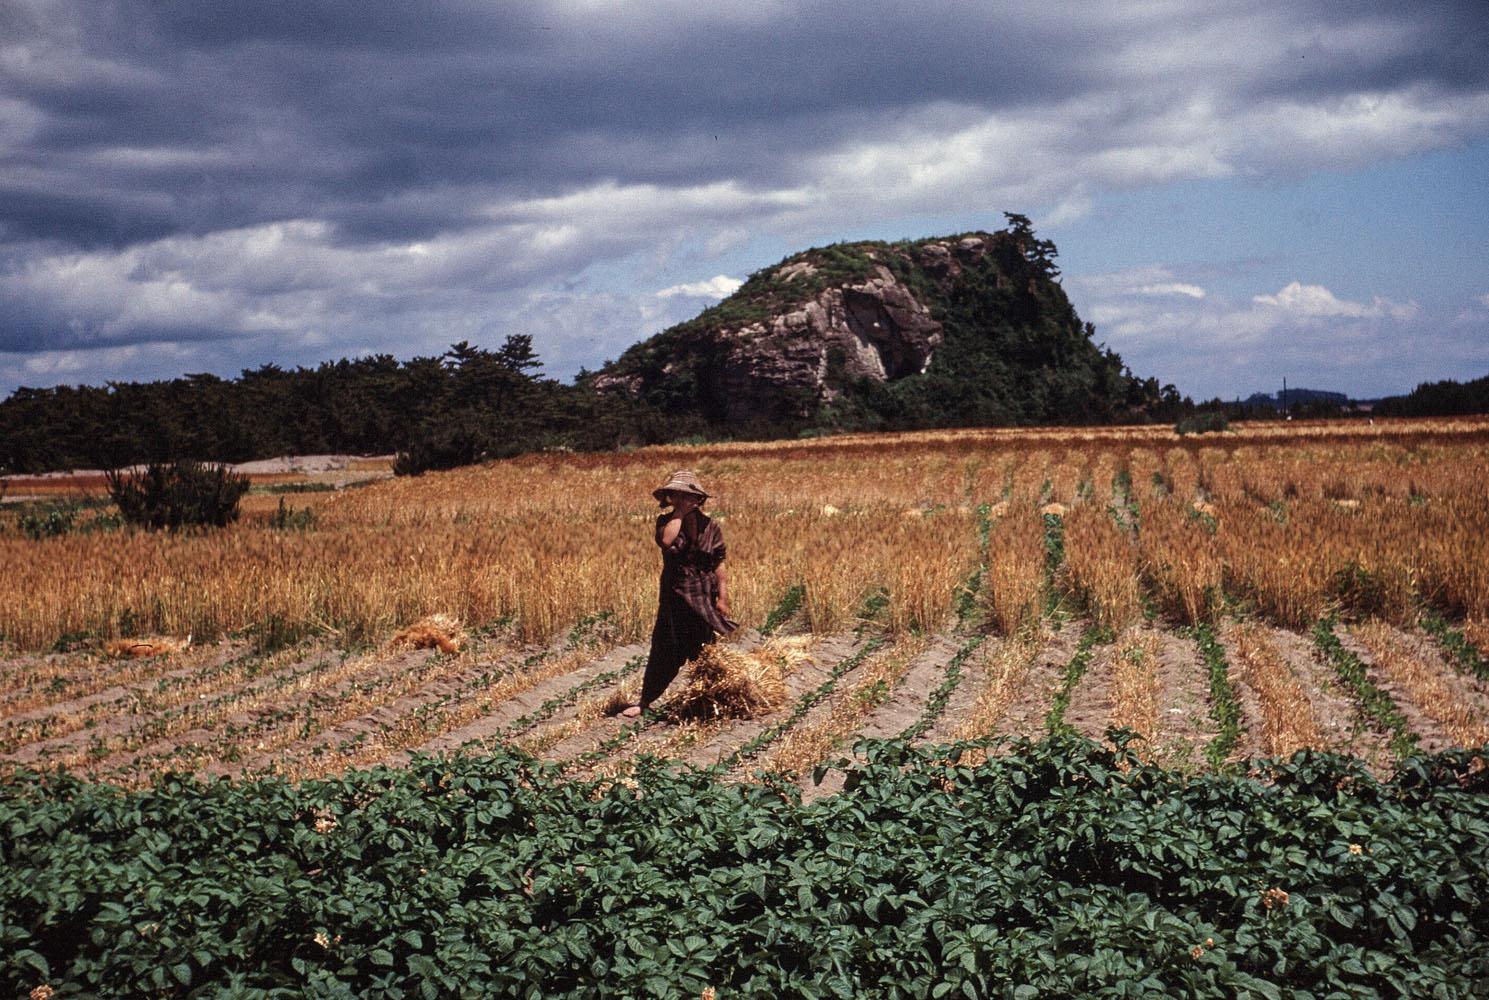 456-Rice Fields with Hill Beyond- Nobiru, Higashimatsushima